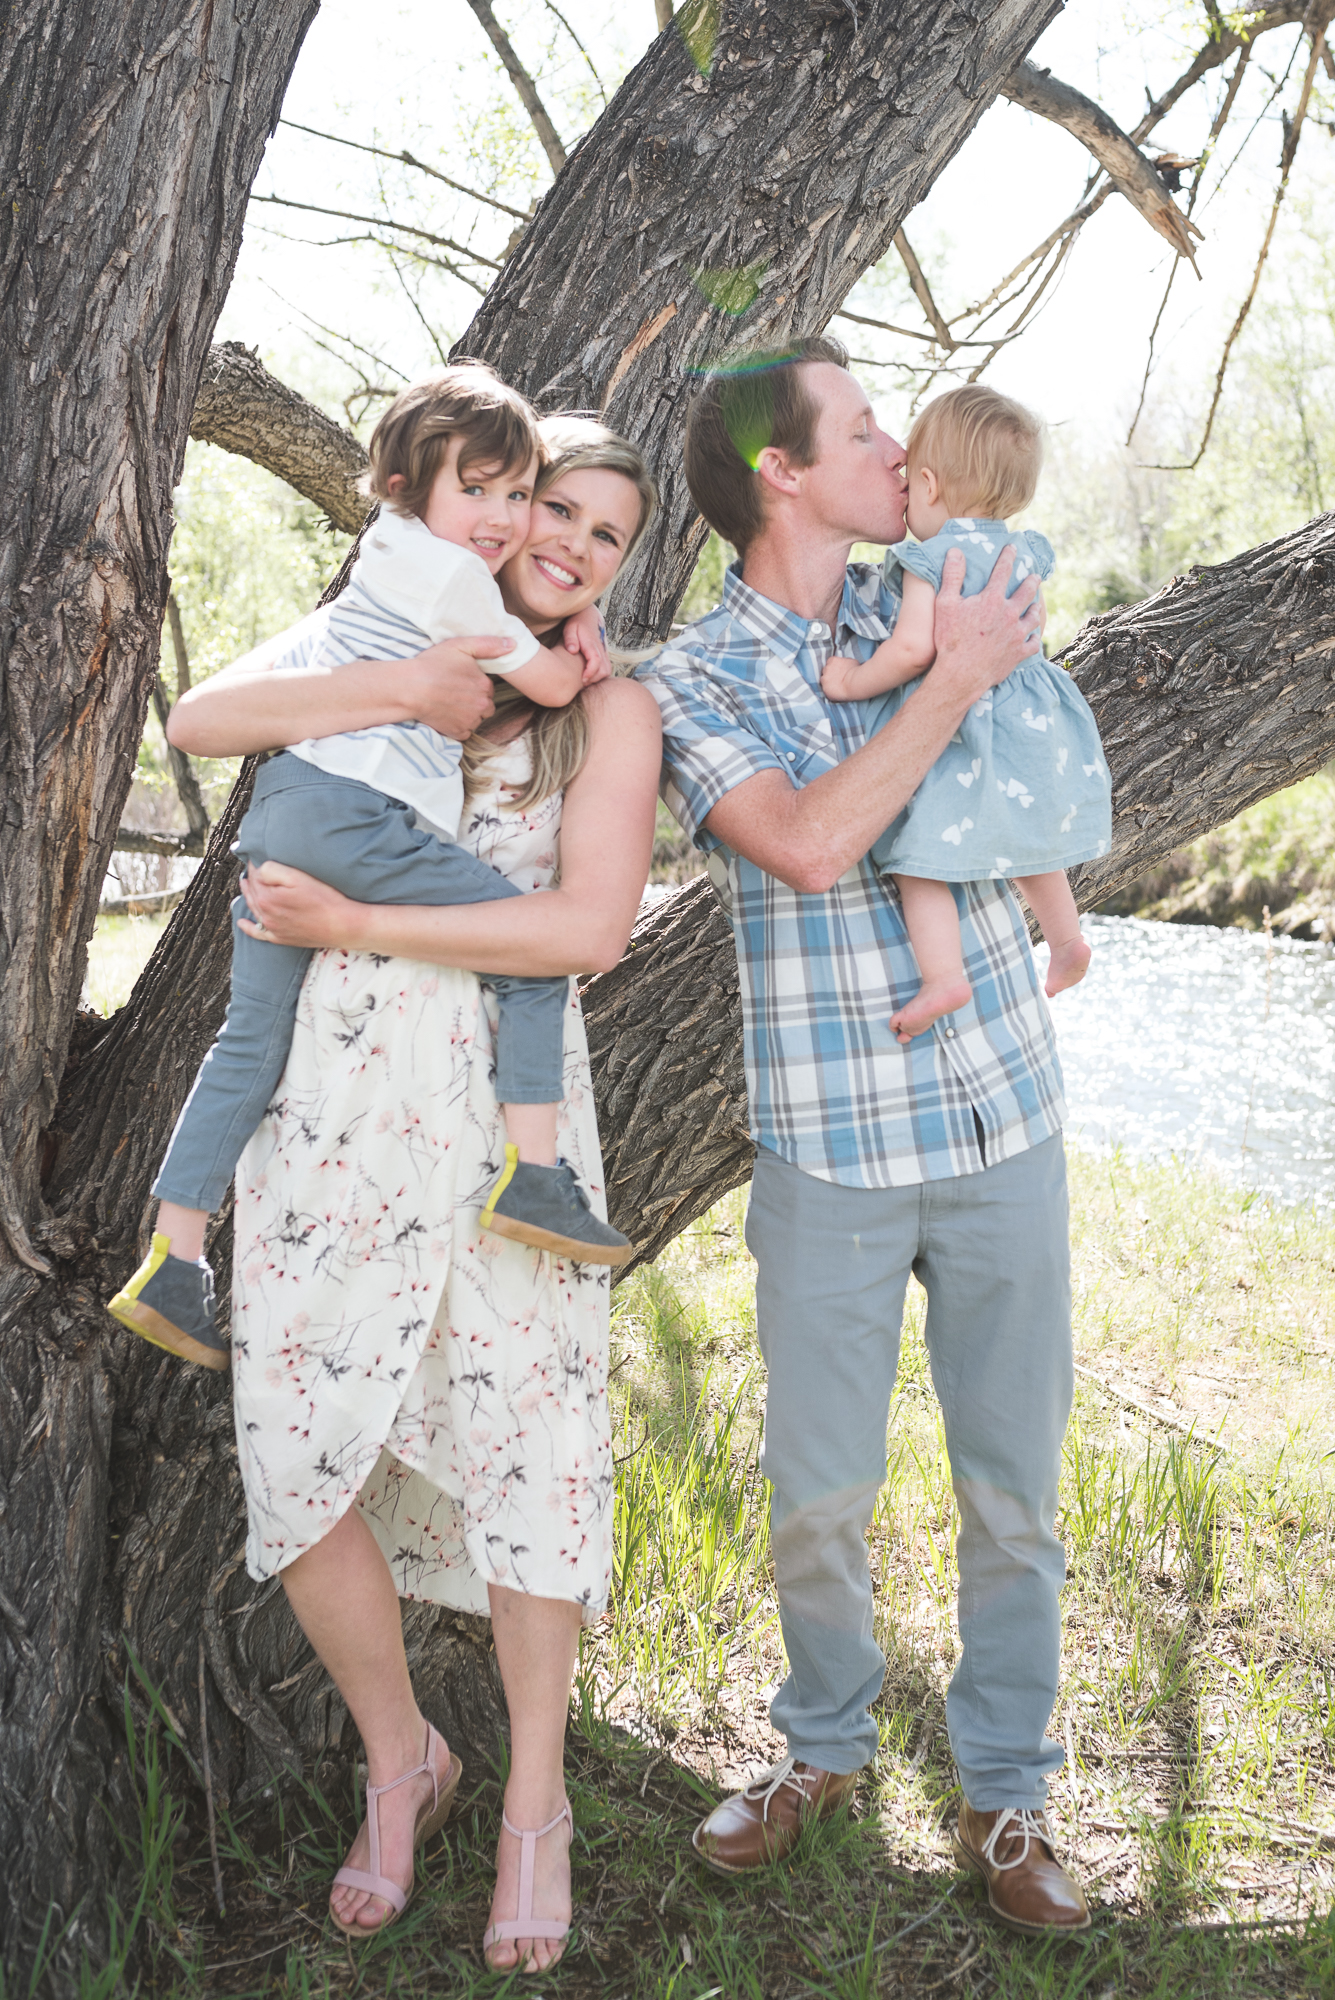 Denver+Boulder+Lifestyle+Family+Photographer+MiniSessions+JennyFolmanPhotography-3.jpg